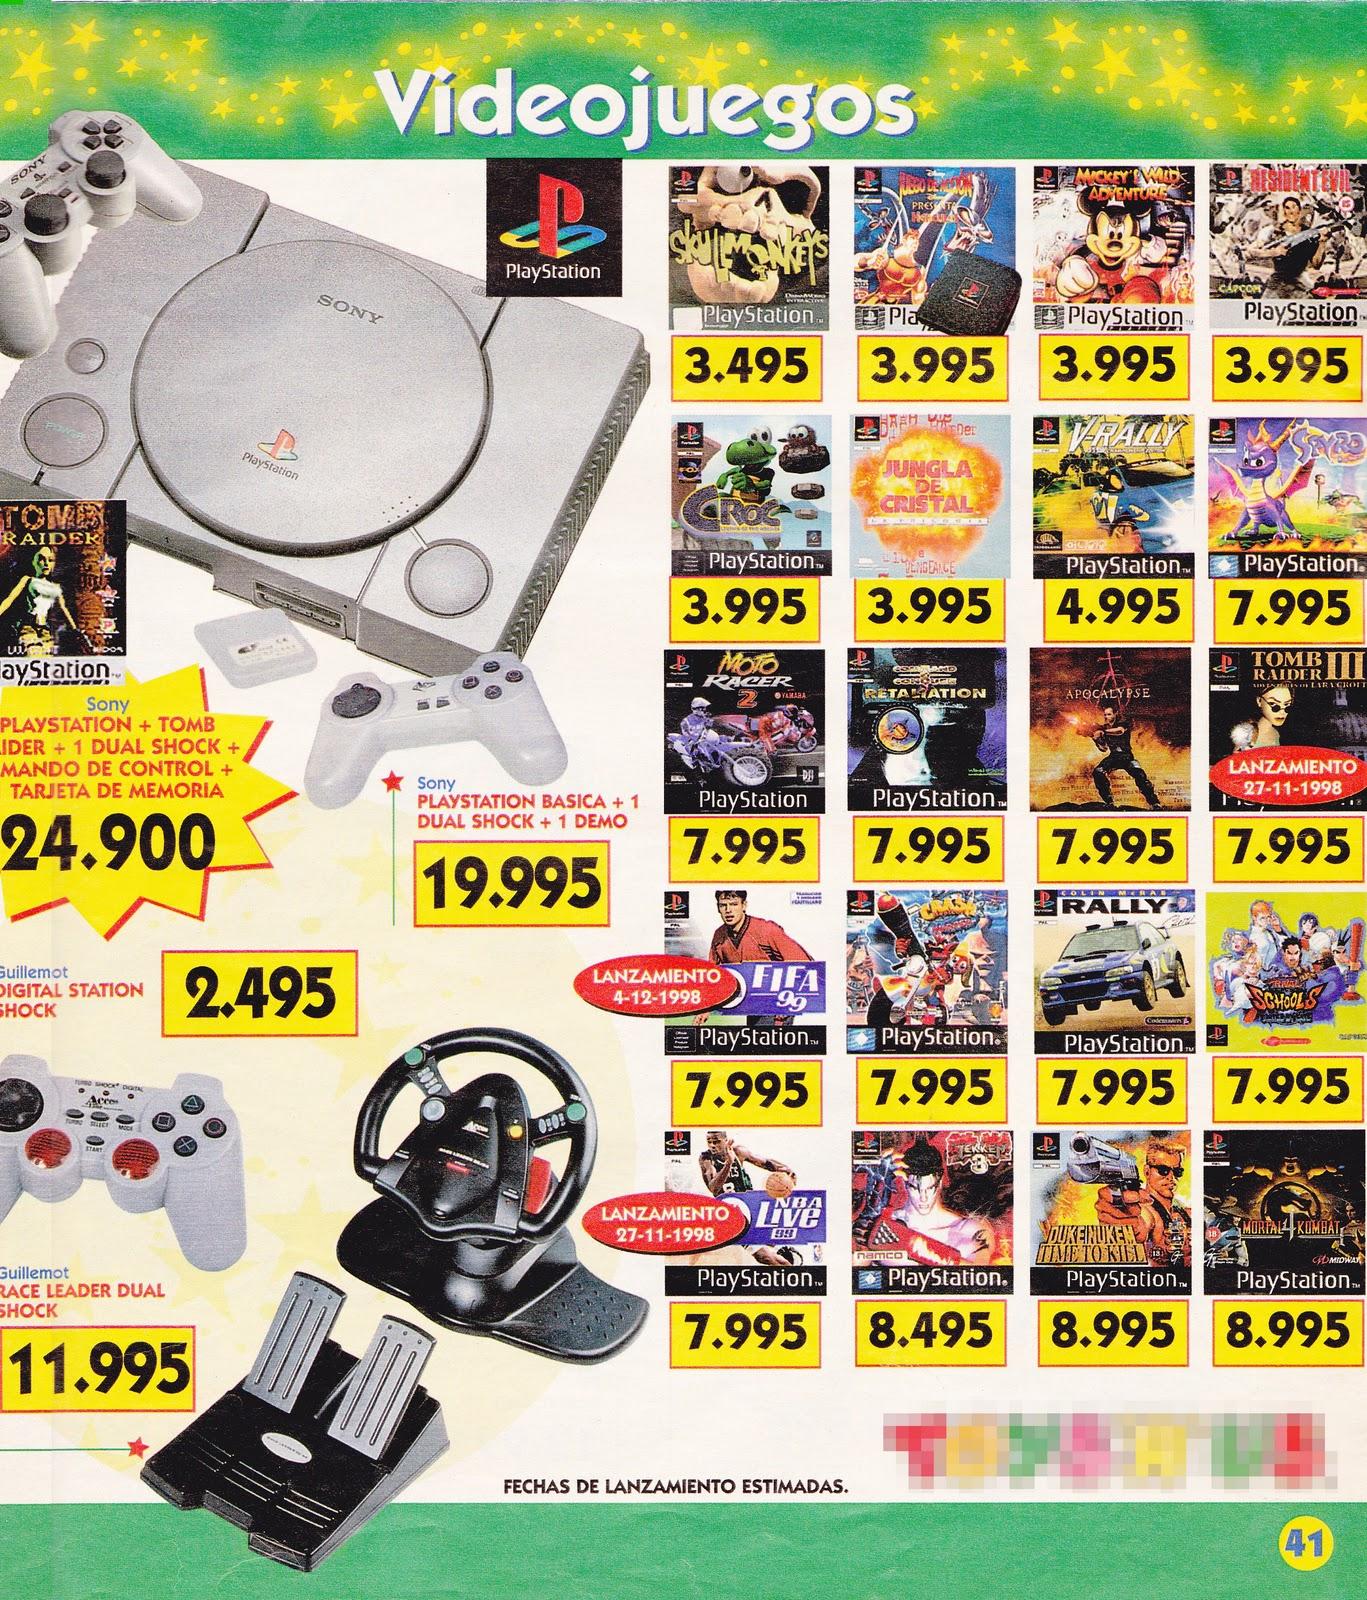 98+Toys%2527r%2527us+98+%25282%2529.jpg